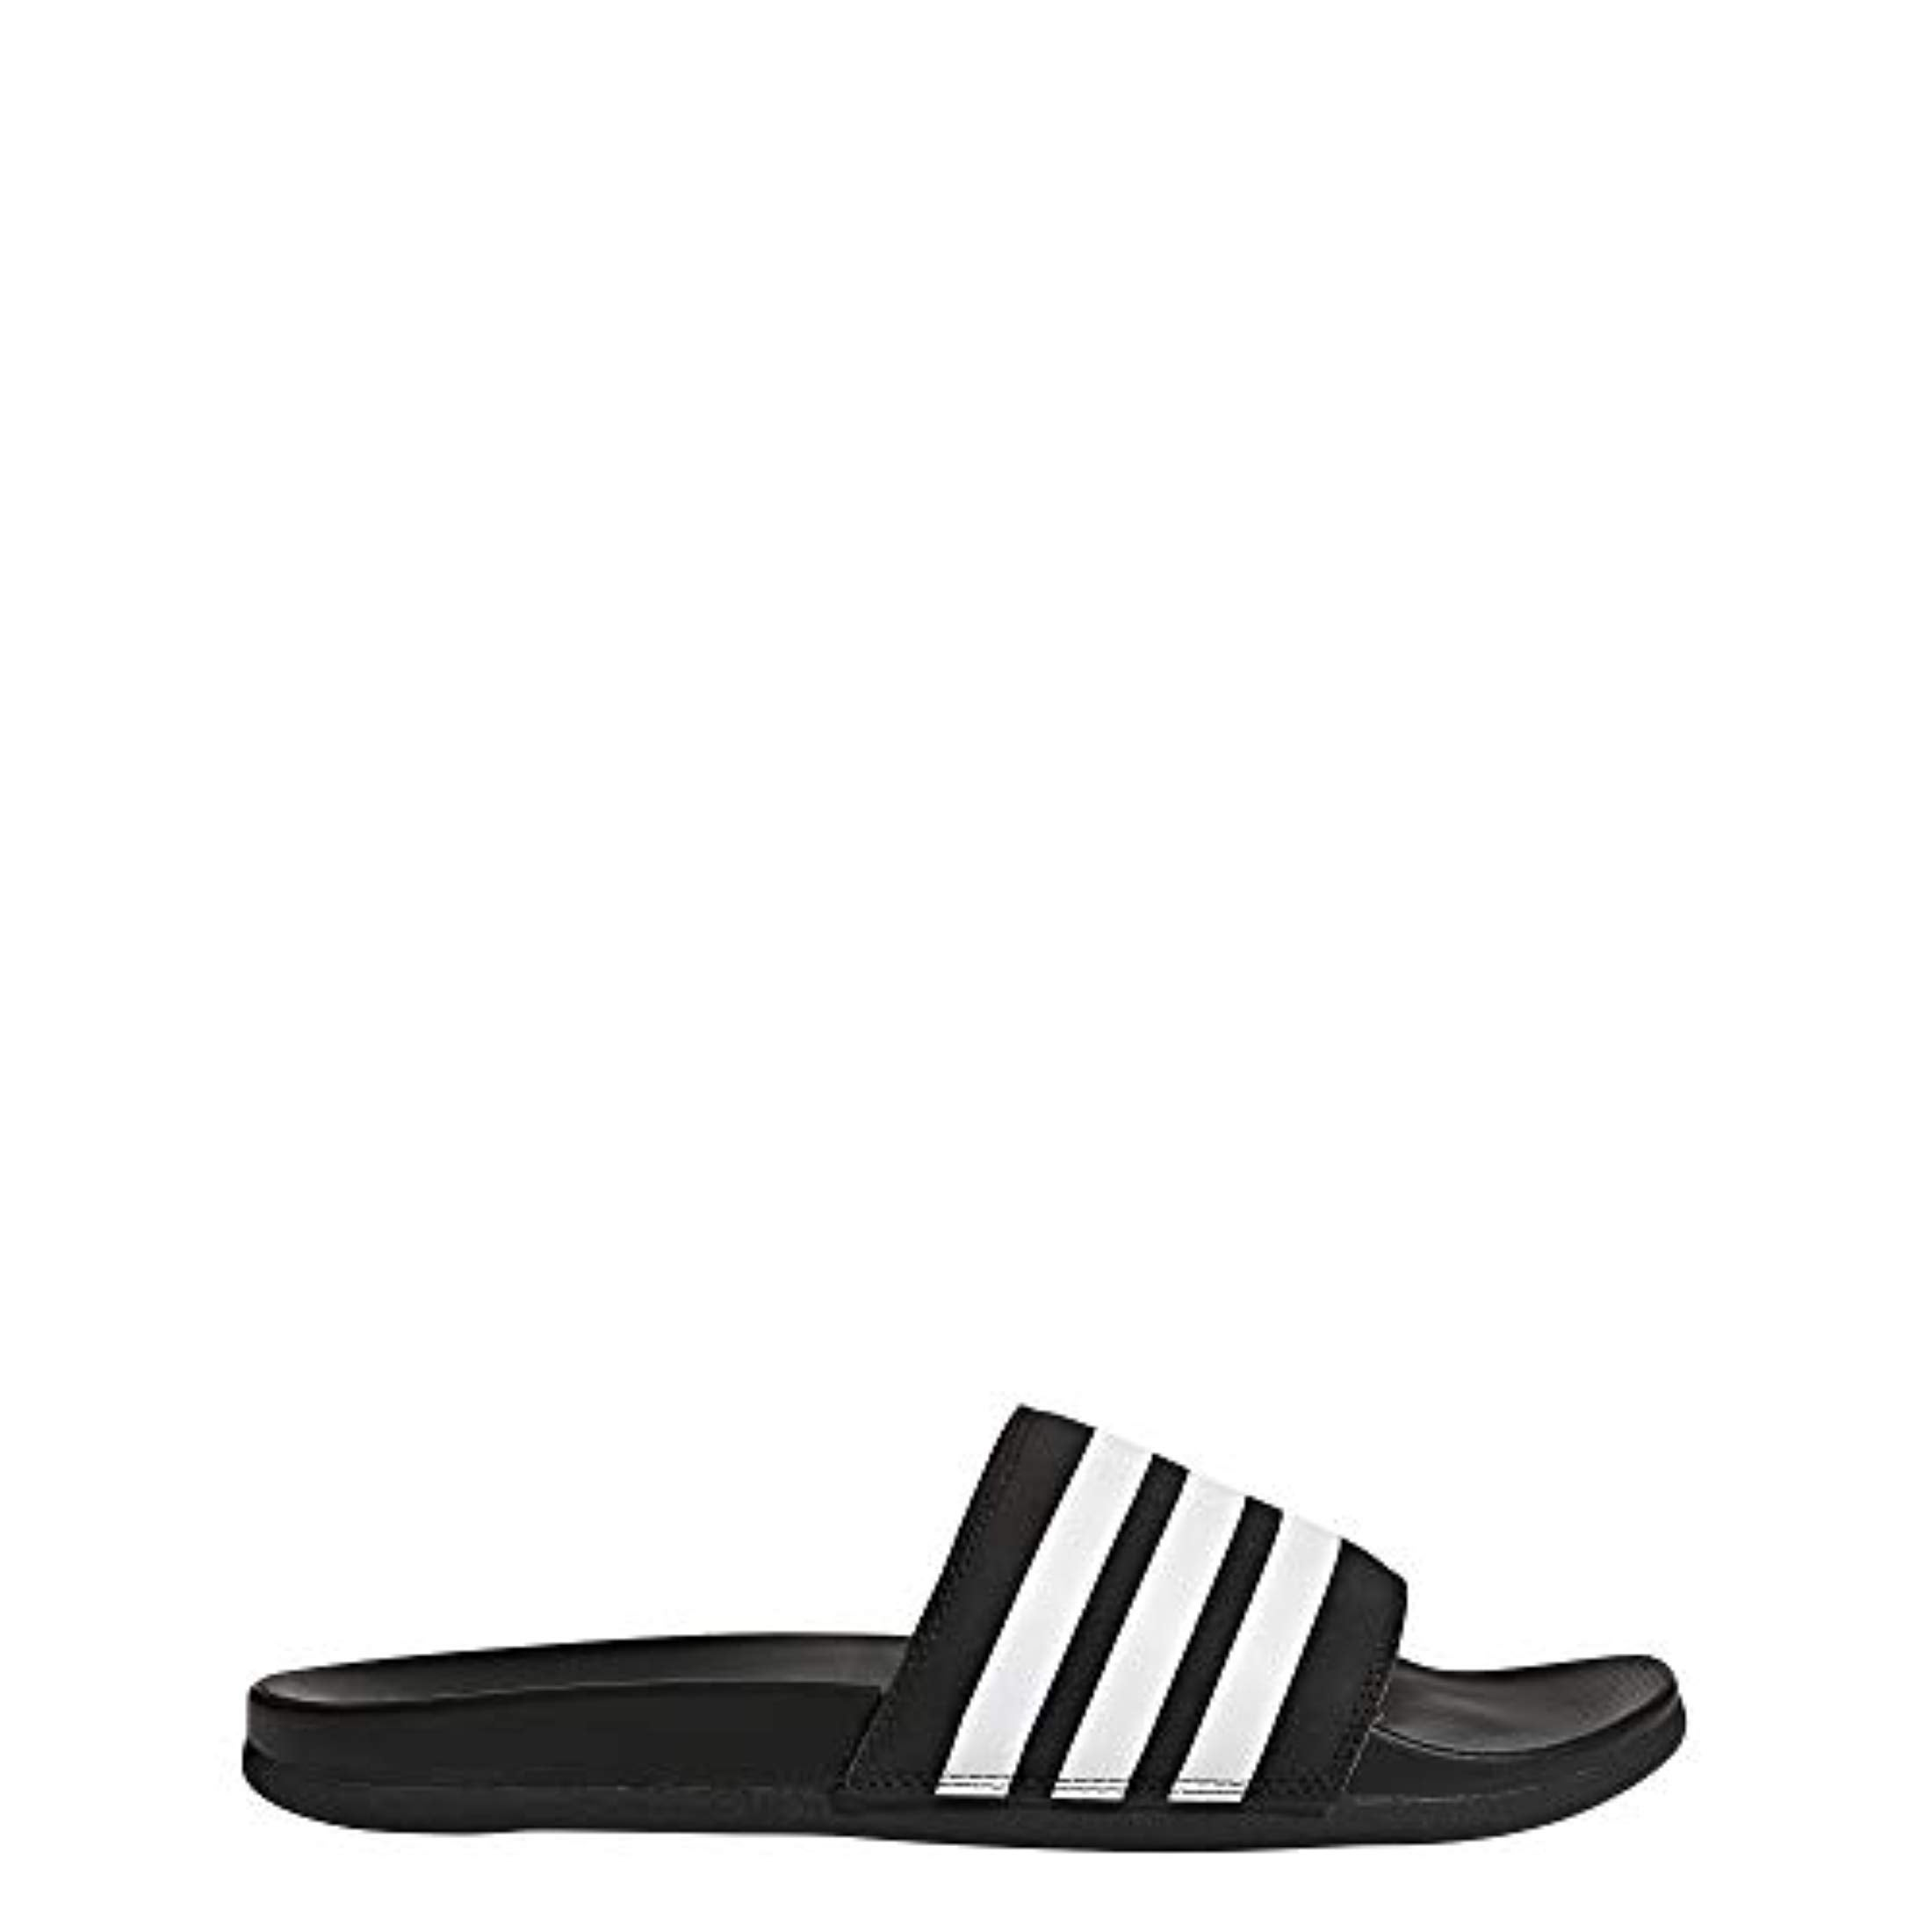 2bd06323f524 Shop Adidas Men s Adilette Comfort Slide Sandal White Black - Free Shipping  Today - Overstock - 27122488